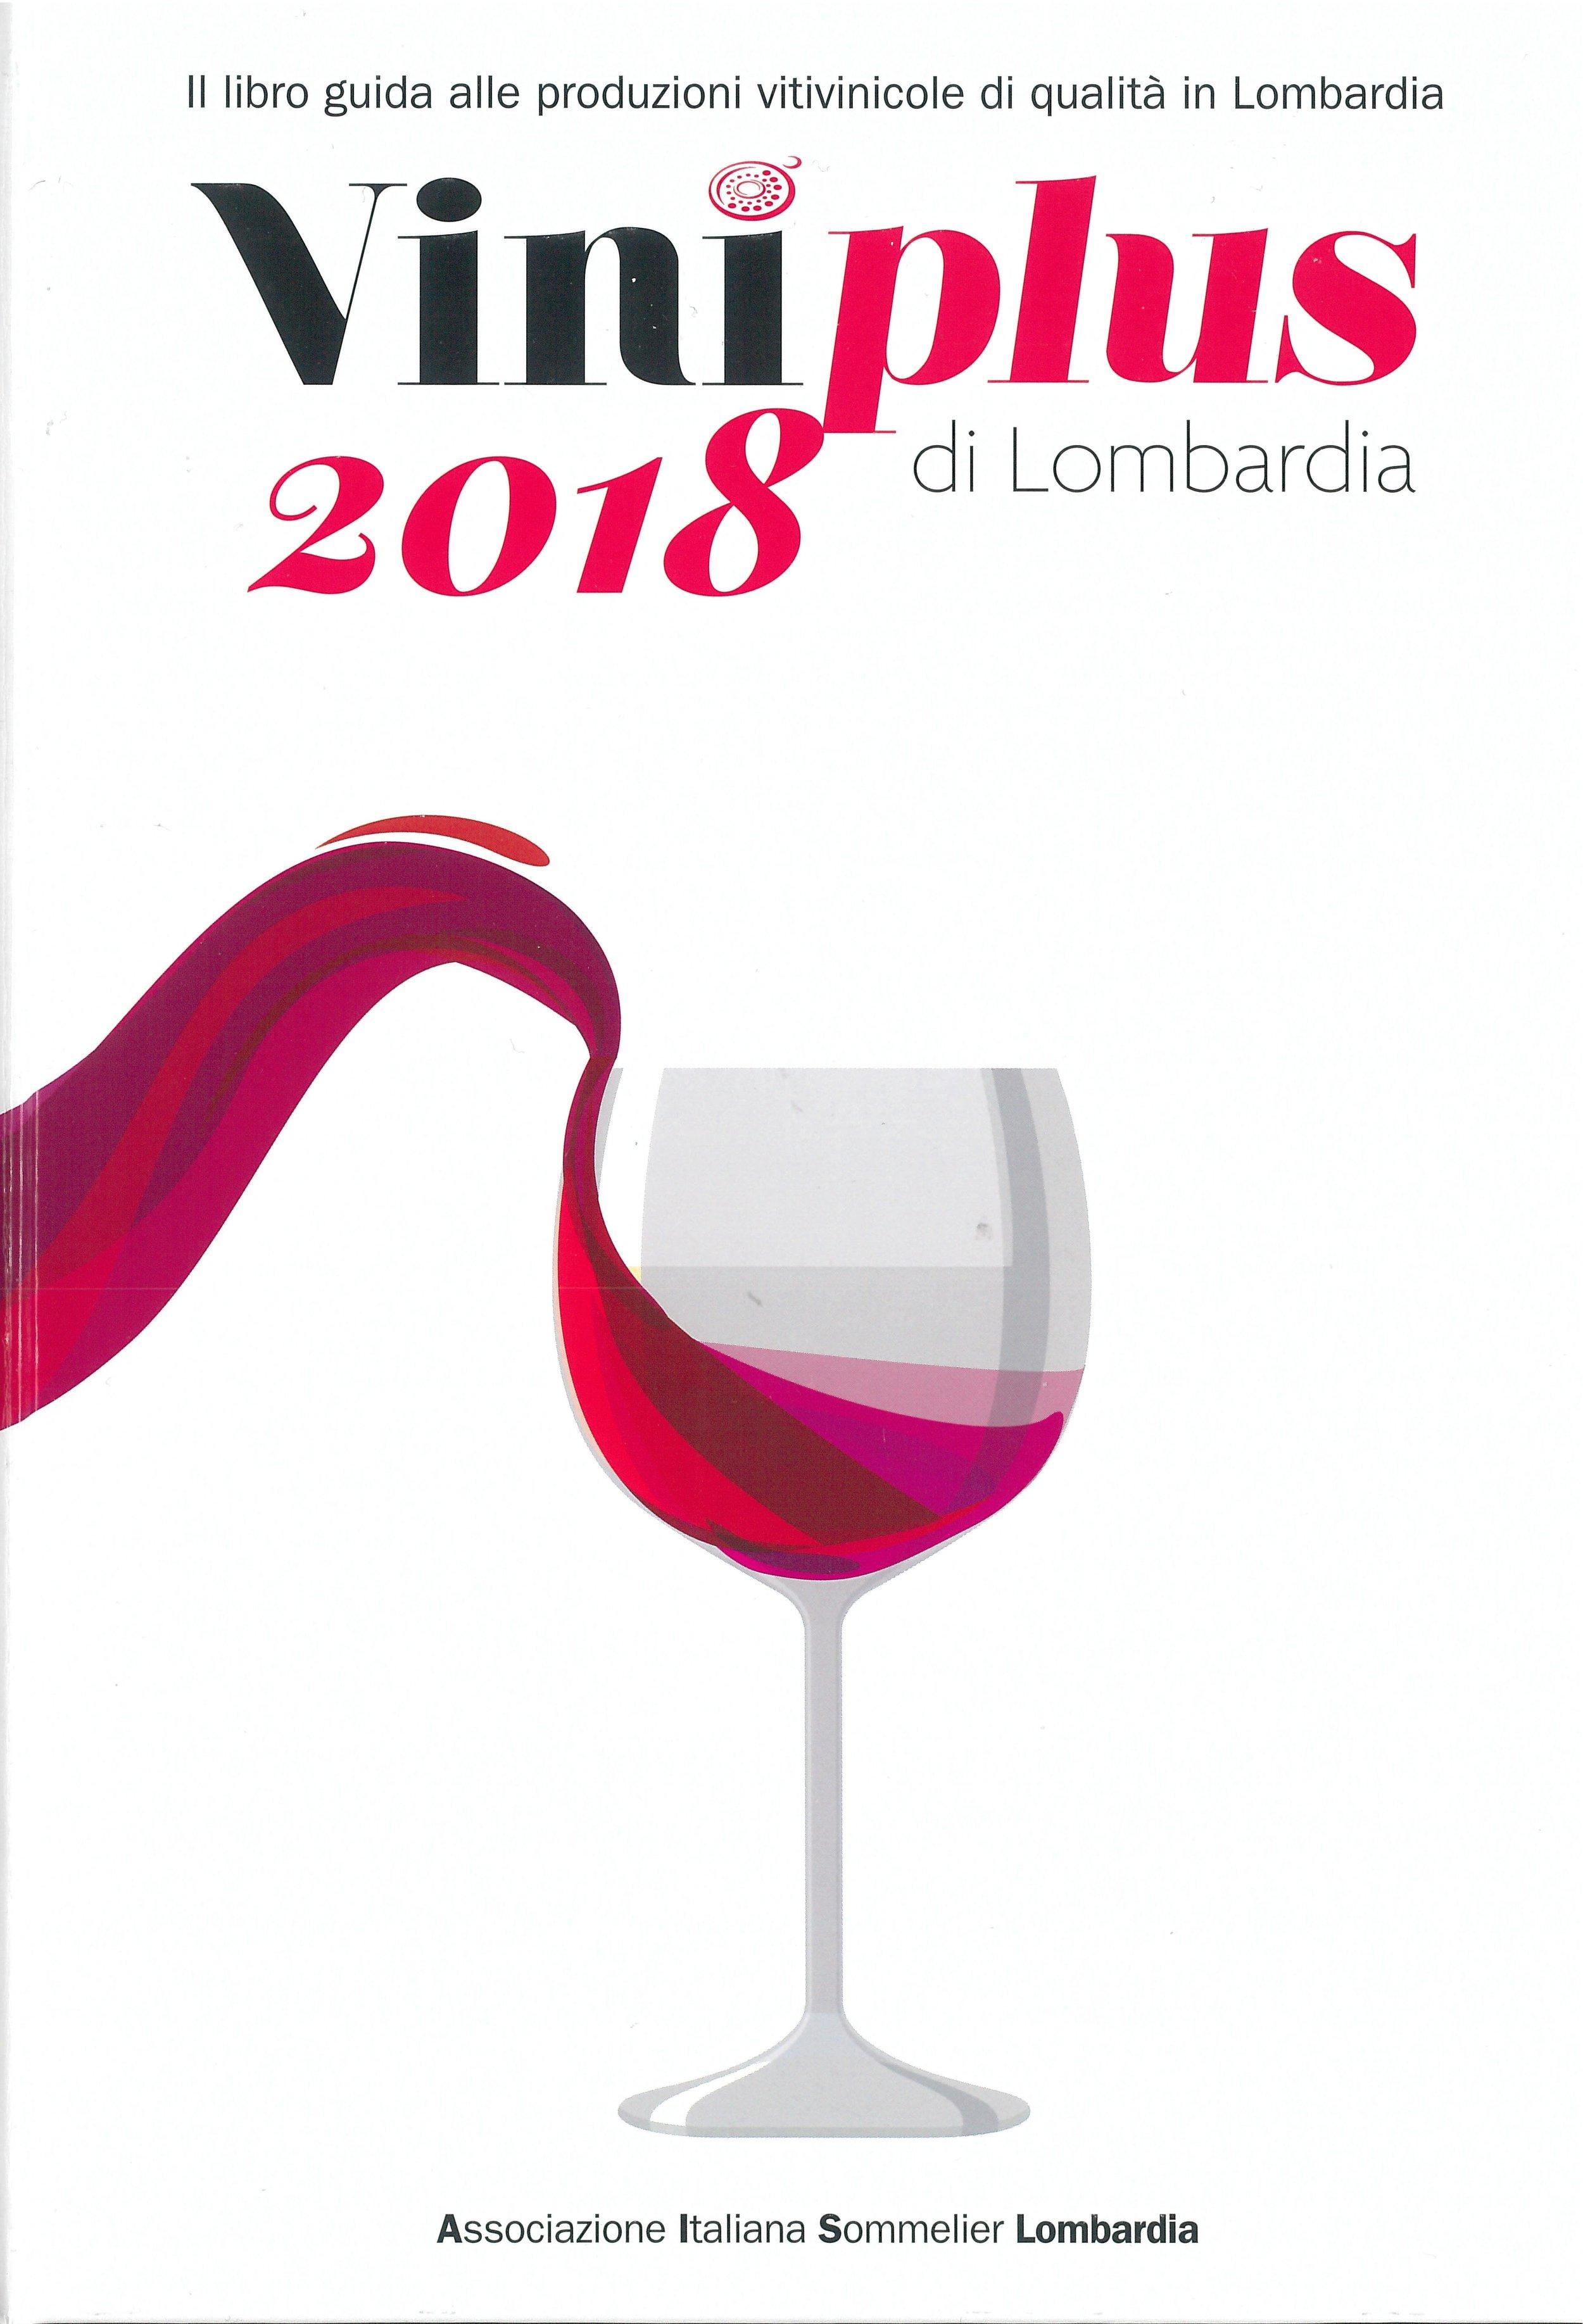 Viniplus Ais Lombardia_2018_Cover.jpg